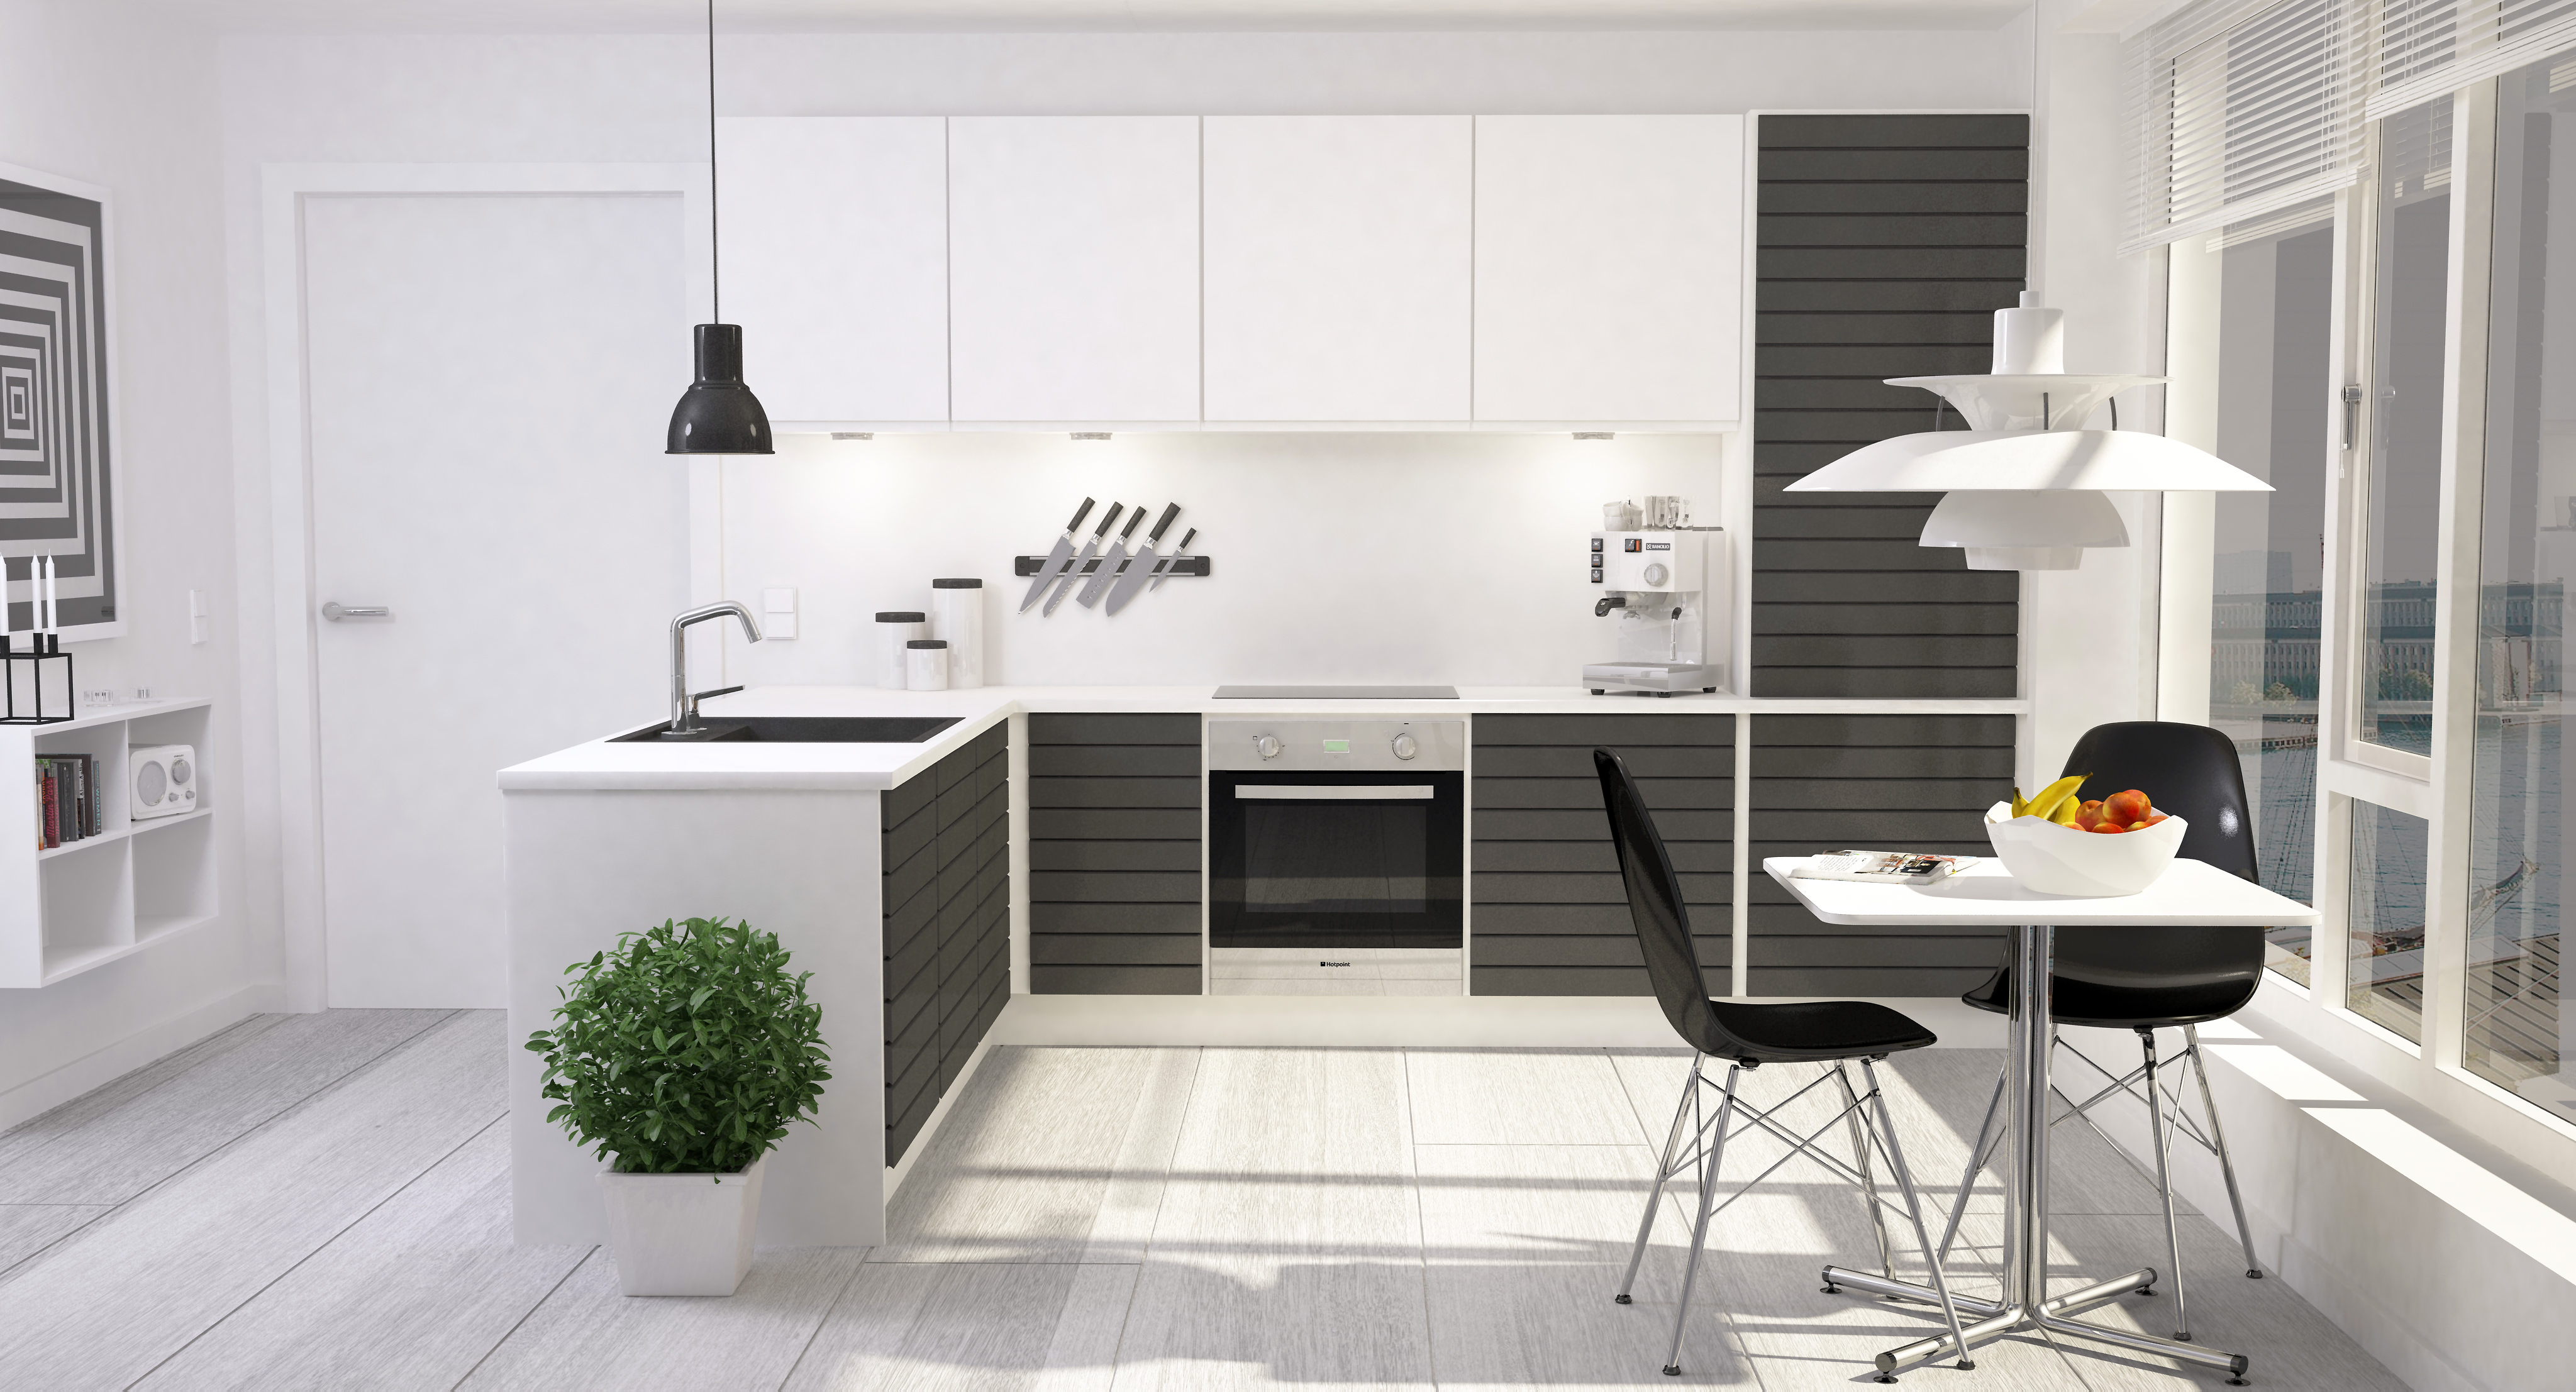 modern kitchen interior 001 3d model max obj fbx dxf dwg 2